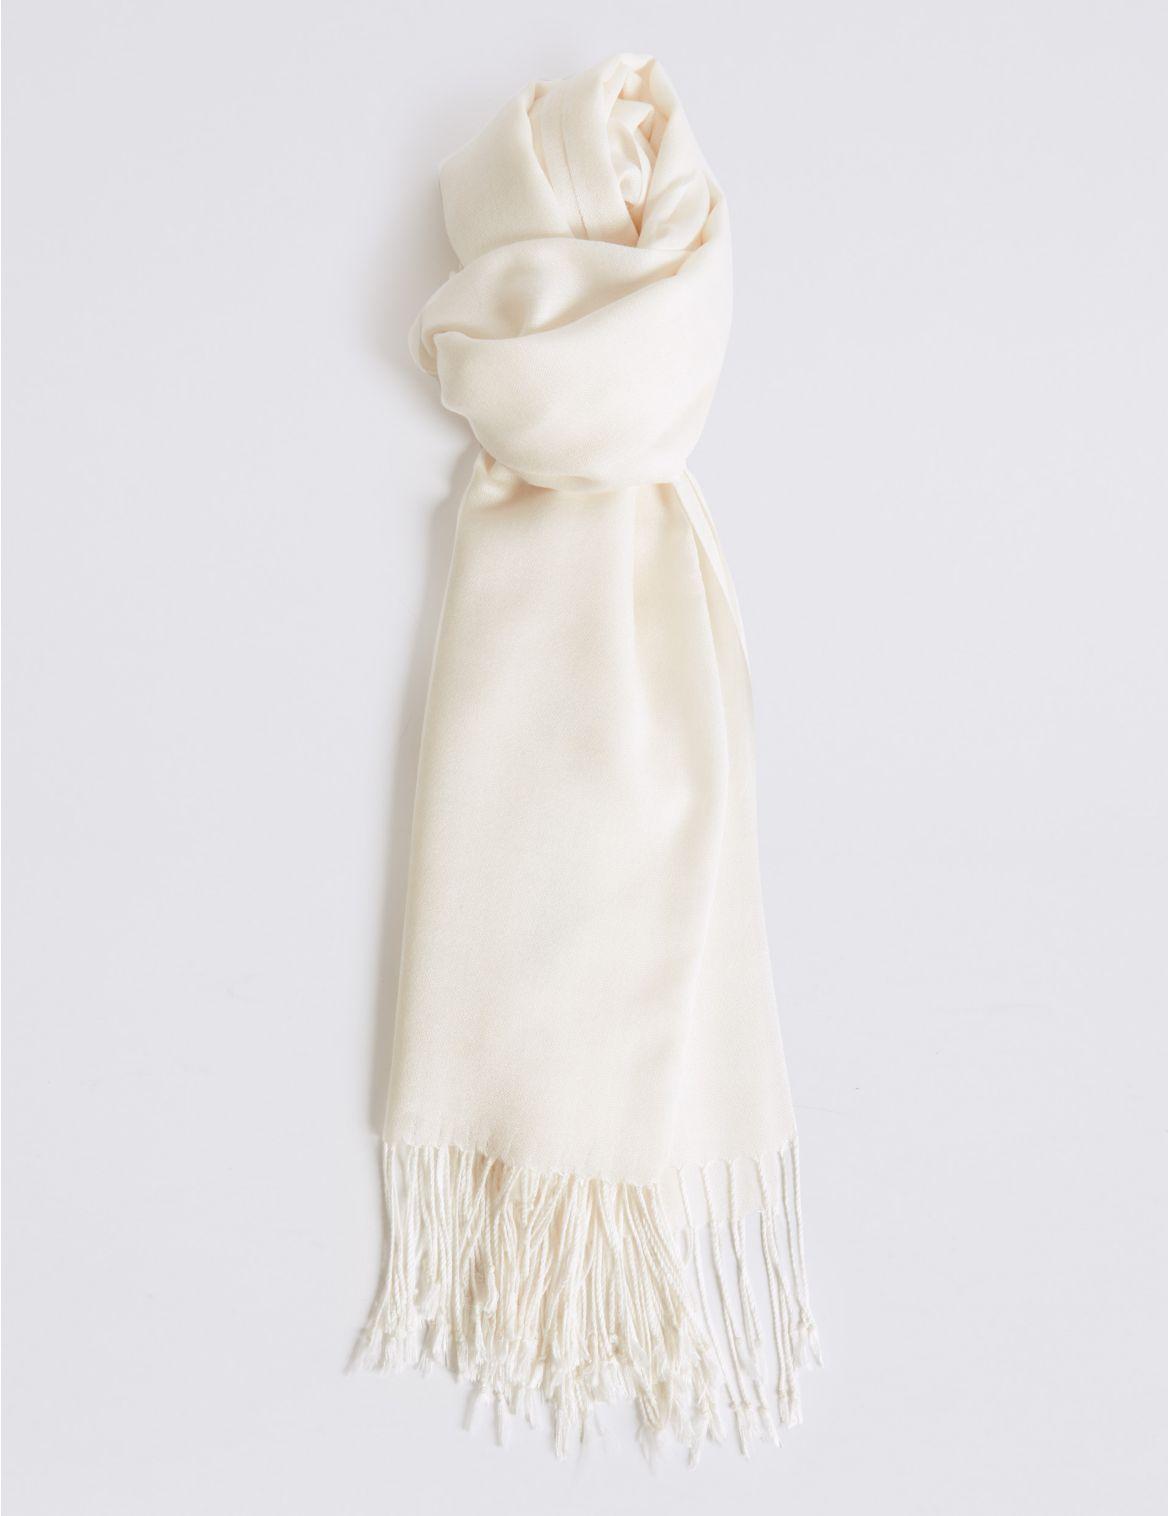 Foulard pashminette en modal